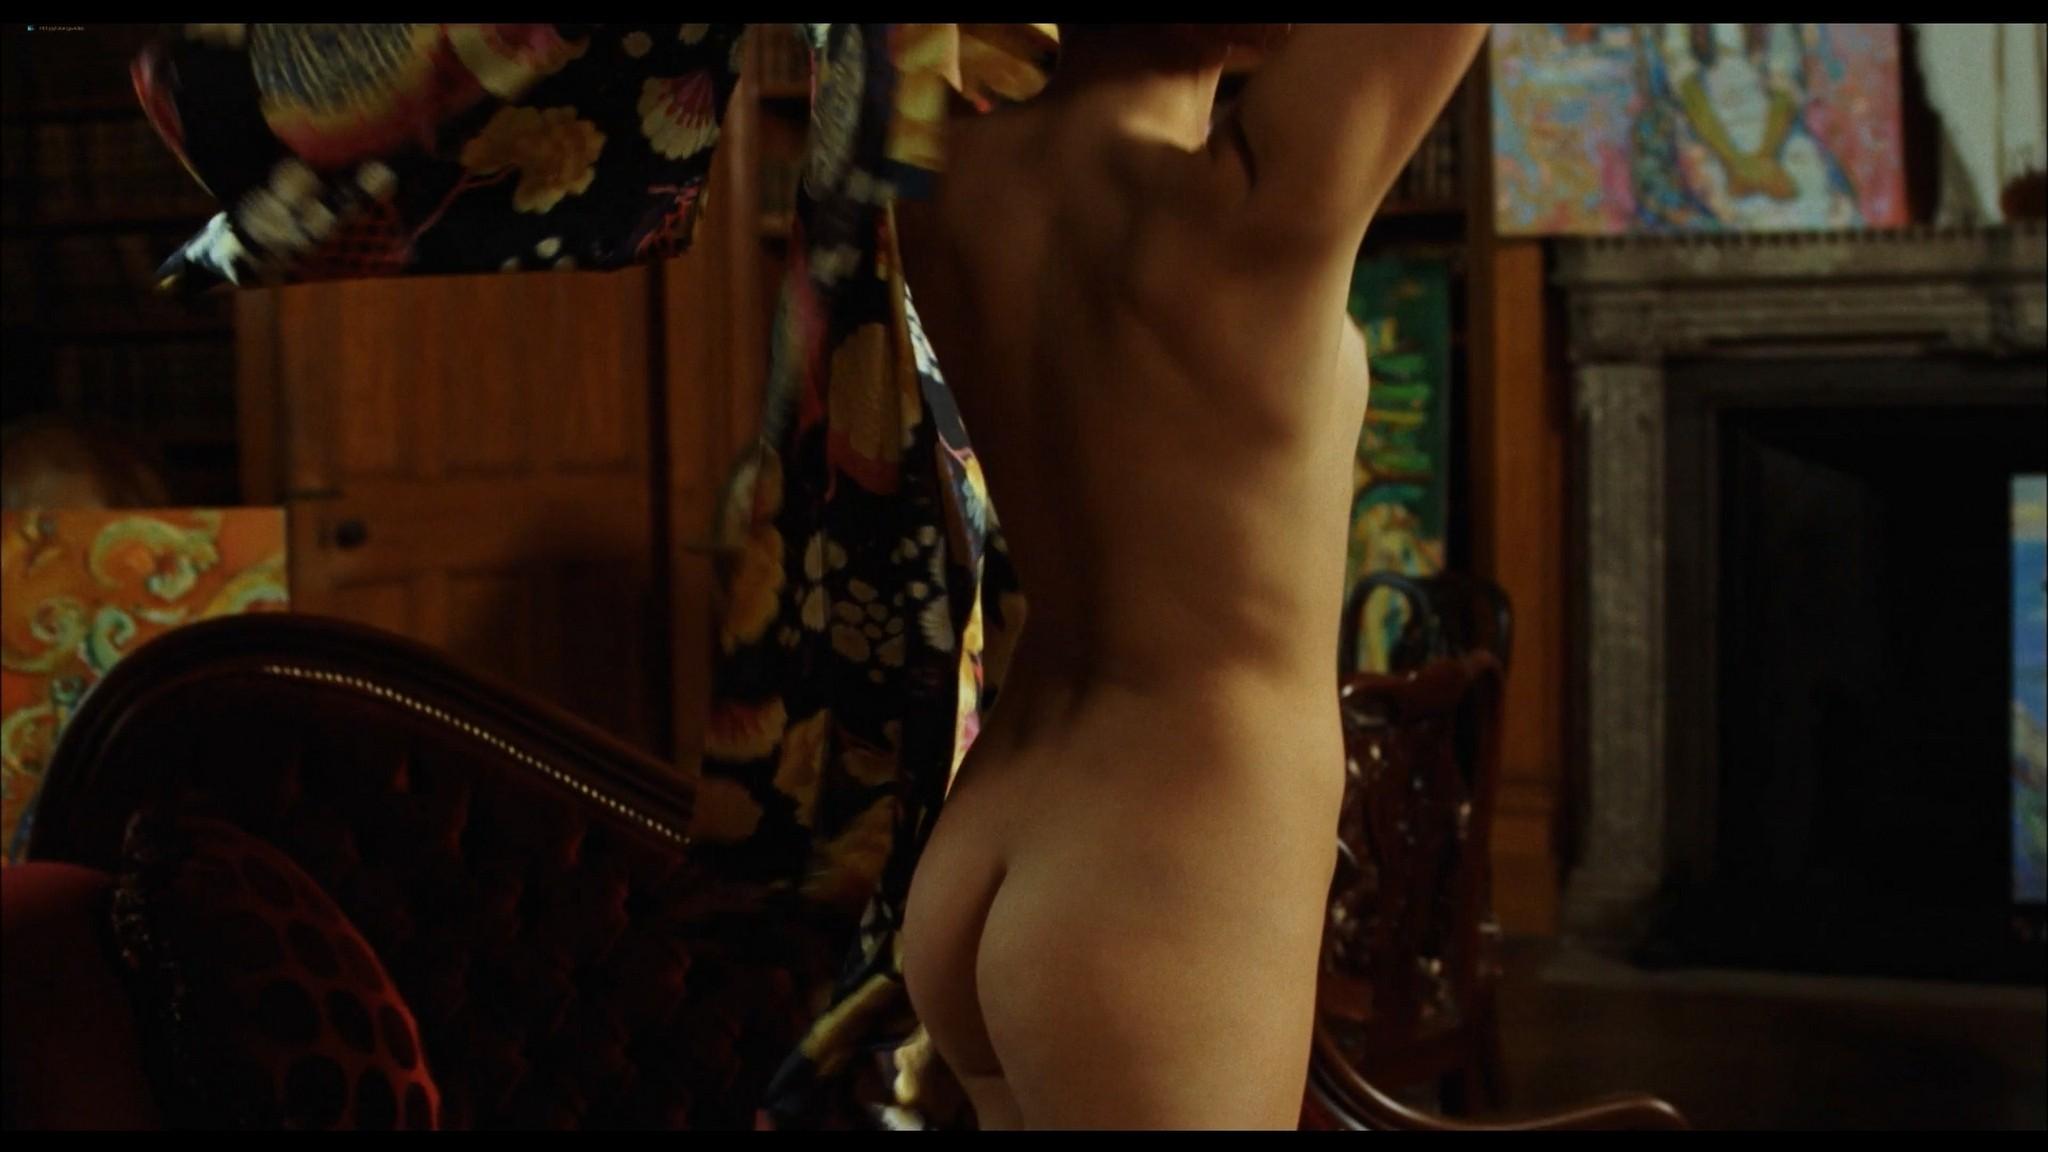 Avalon Barrie nude and Lyudmila Shiryaeva nude full frontal Sappho 2008 HD 1080p BluRay REMUX 24